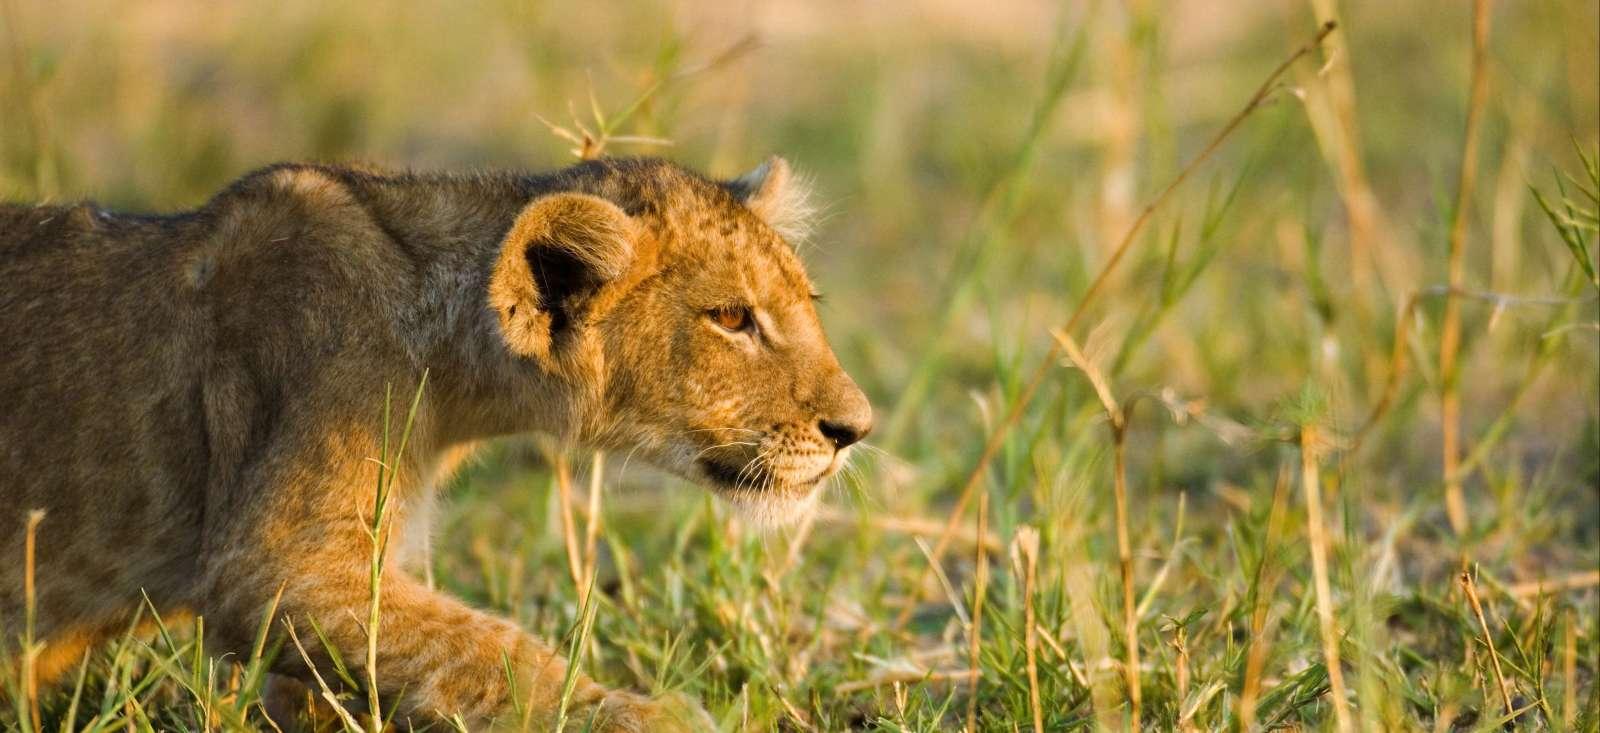 Voyage à pied : Katavi & Ruaha, la Tanzanie sauvage